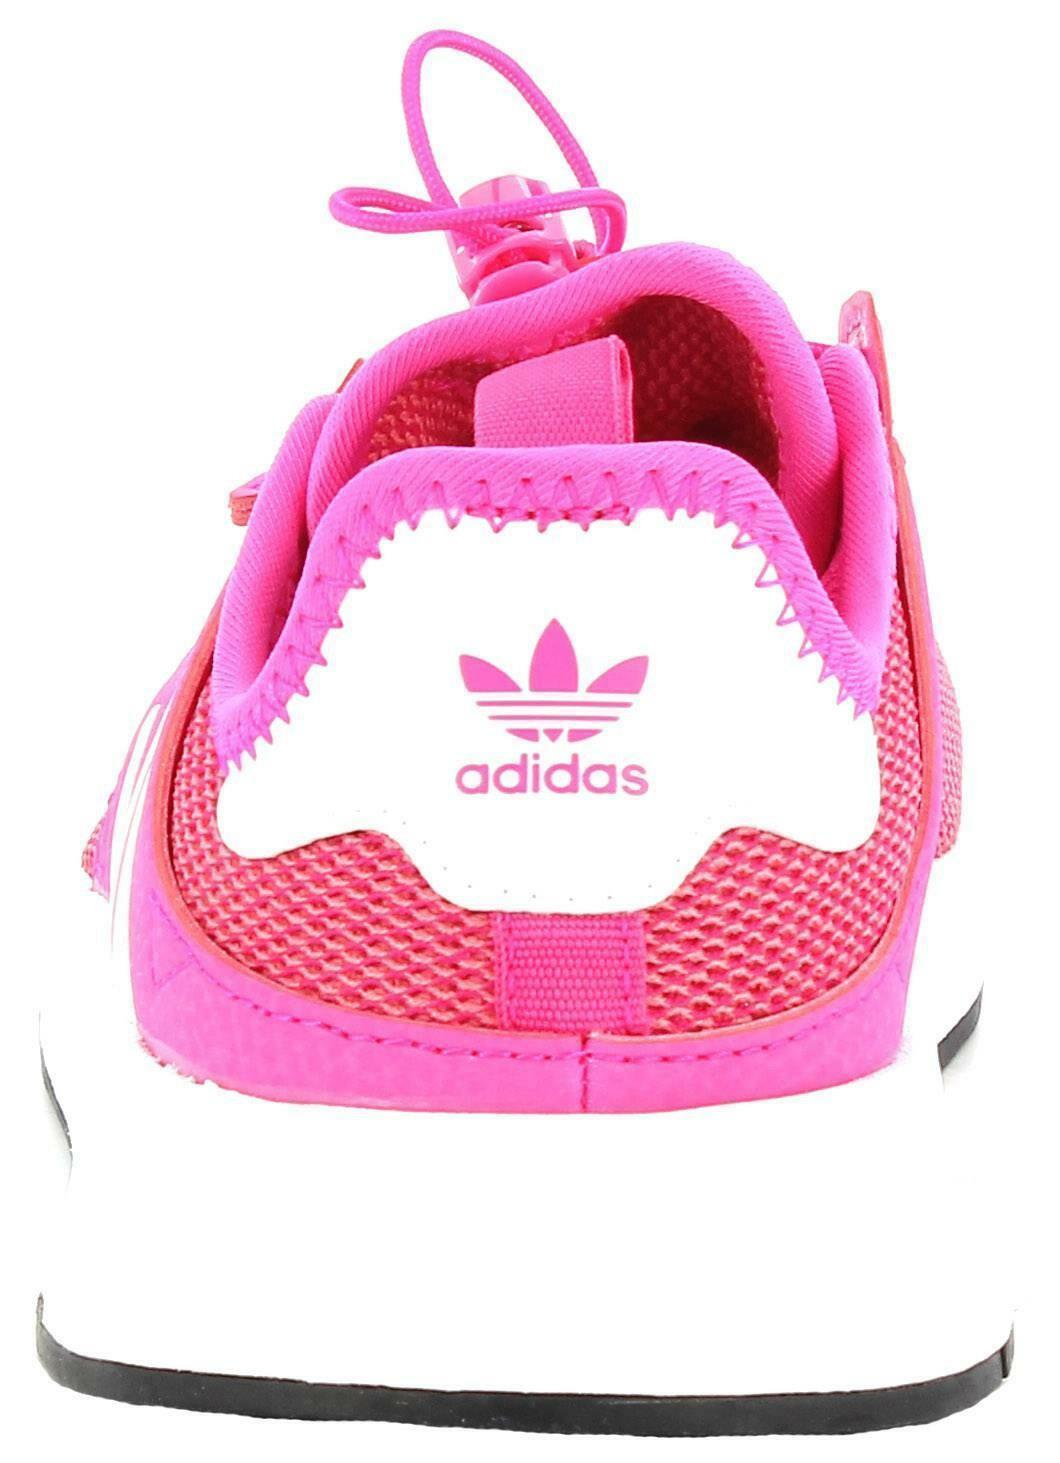 adidas adidas x_plr c scarpe sportive bambina fucsia